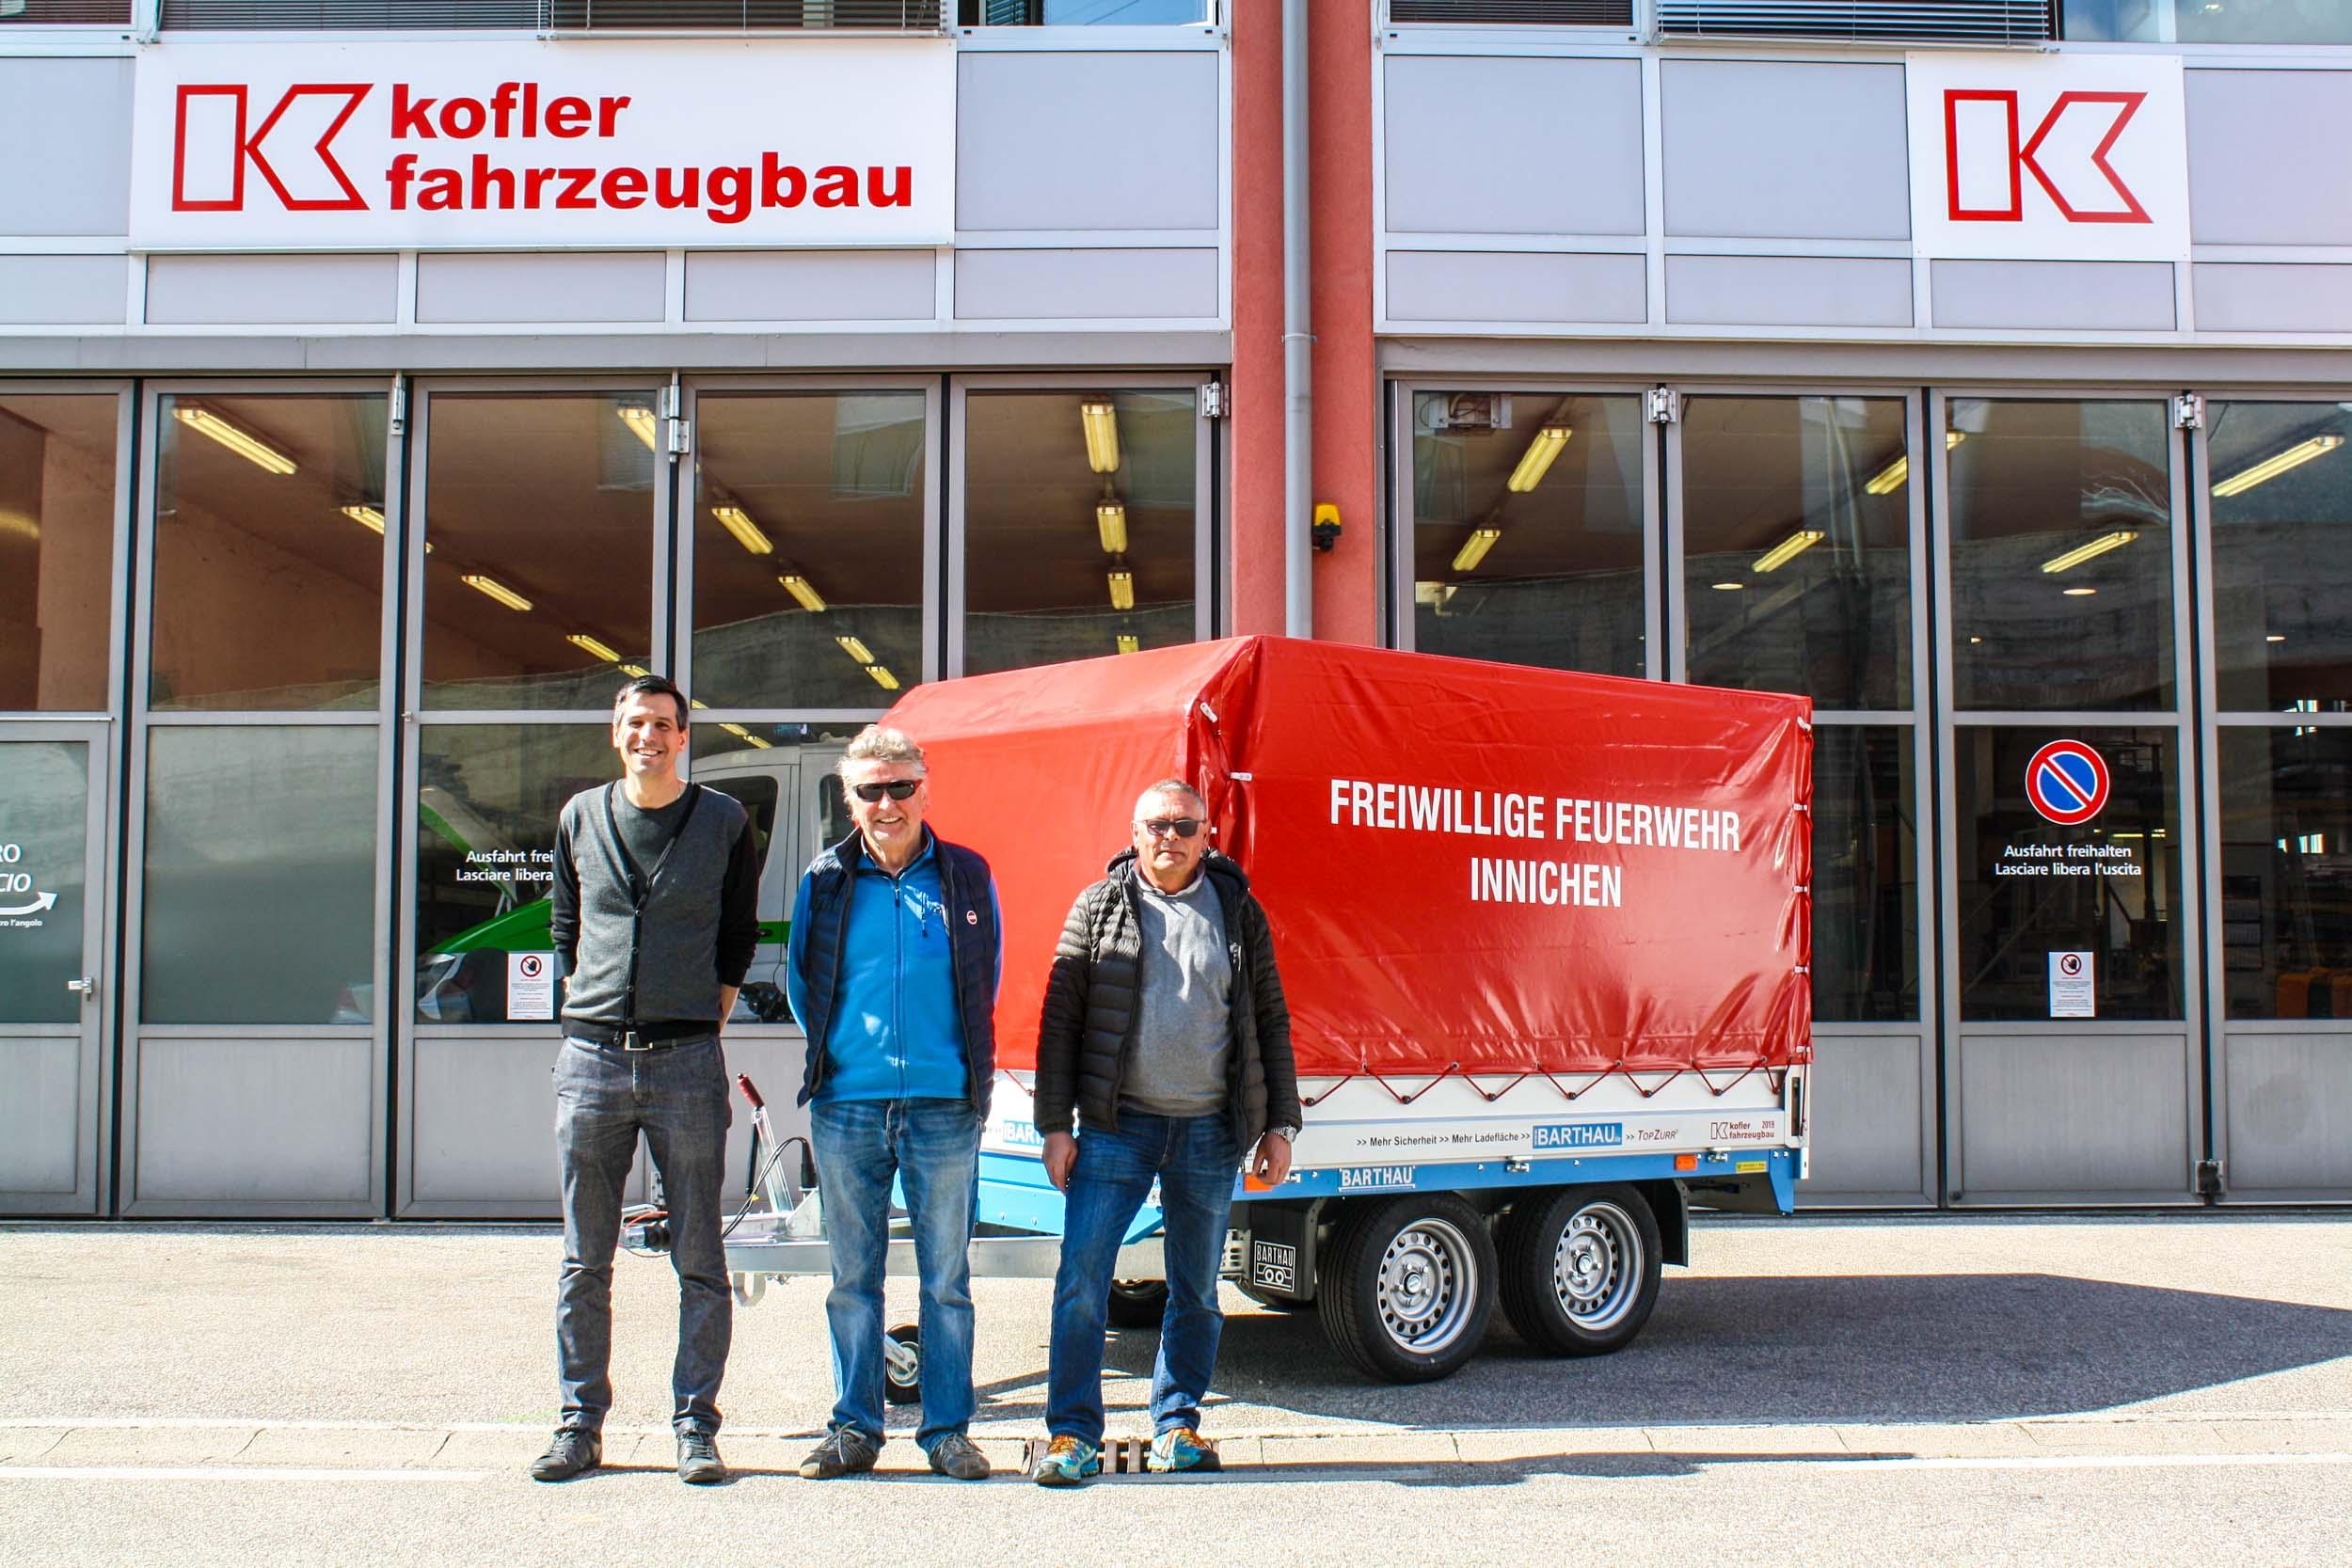 Kofler-Fahrzeugbau-FF-Innichen